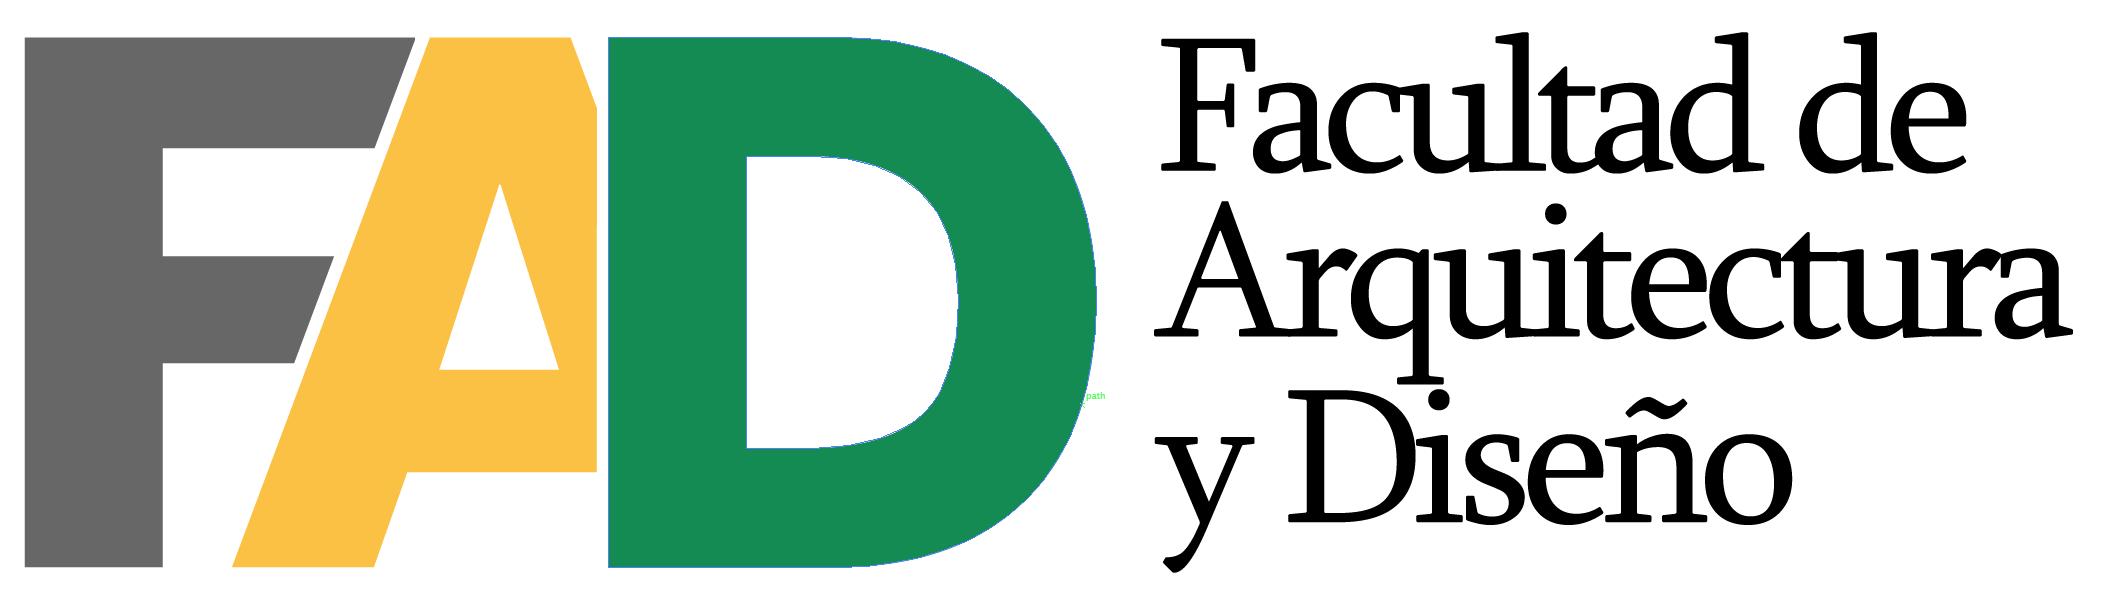 Identidad gr fica Arquitectura y diseno uabc